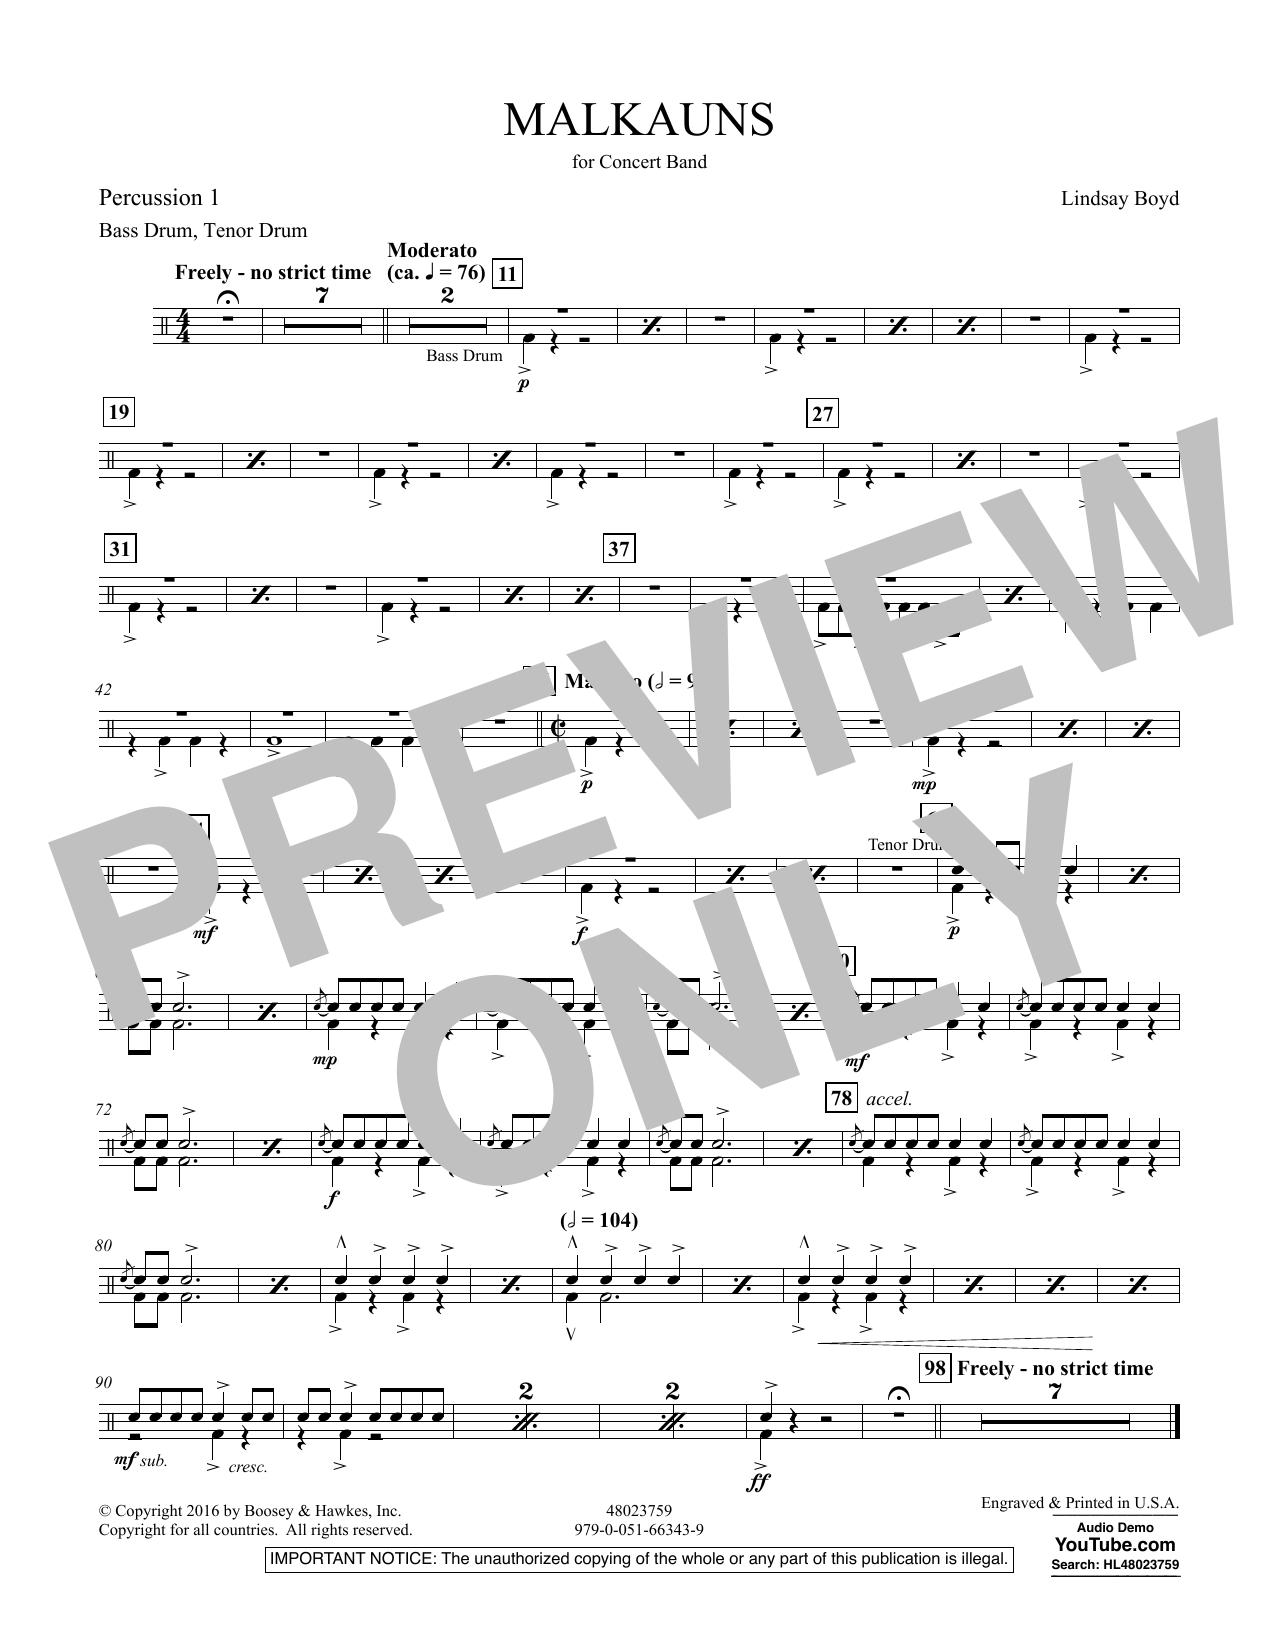 Malkauns - Percussion 1